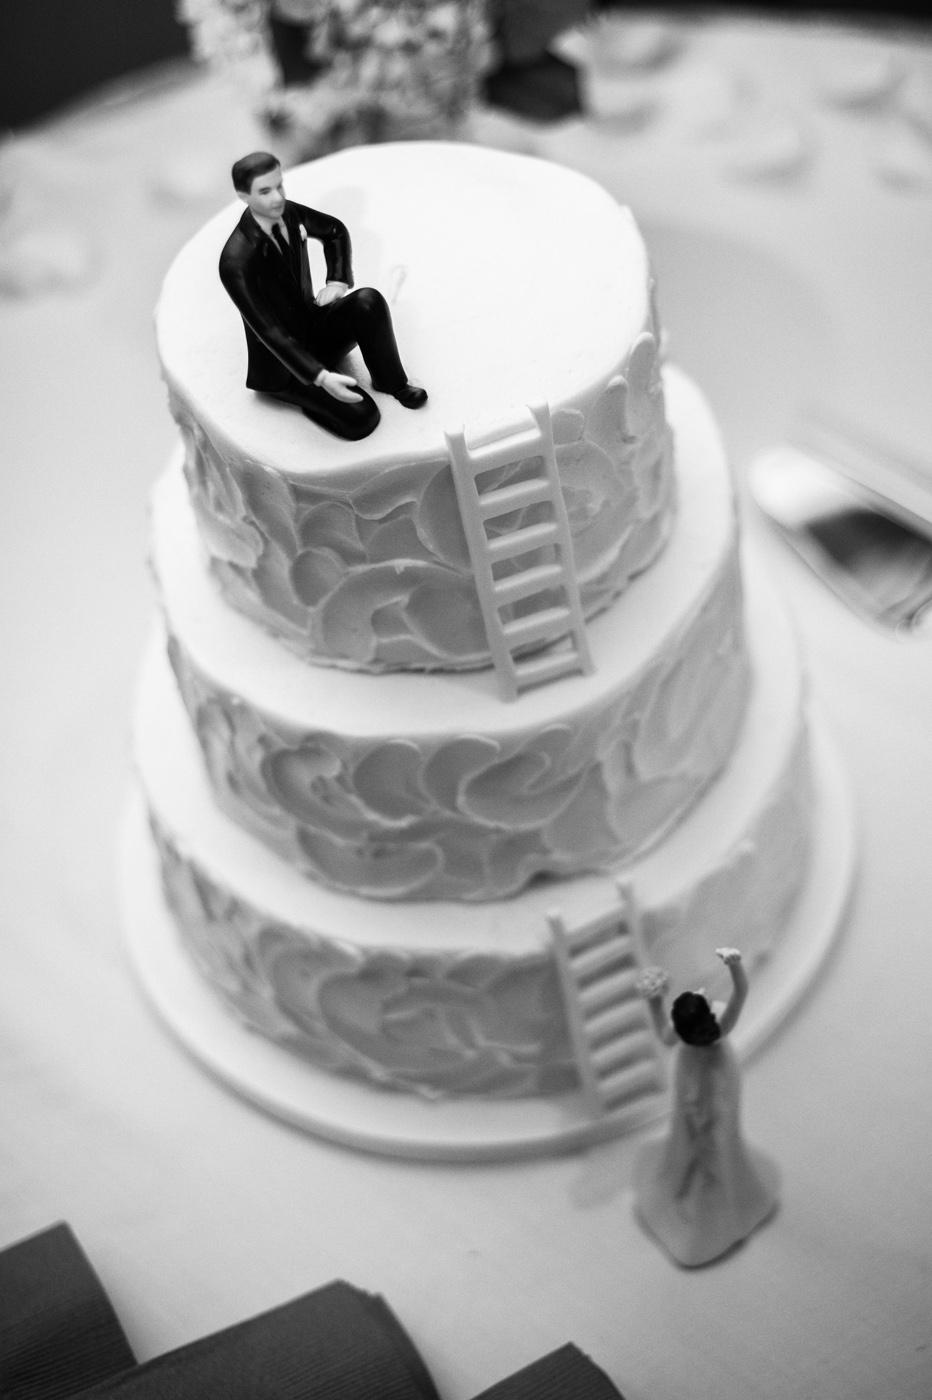 ss_weddingbest-19.jpg